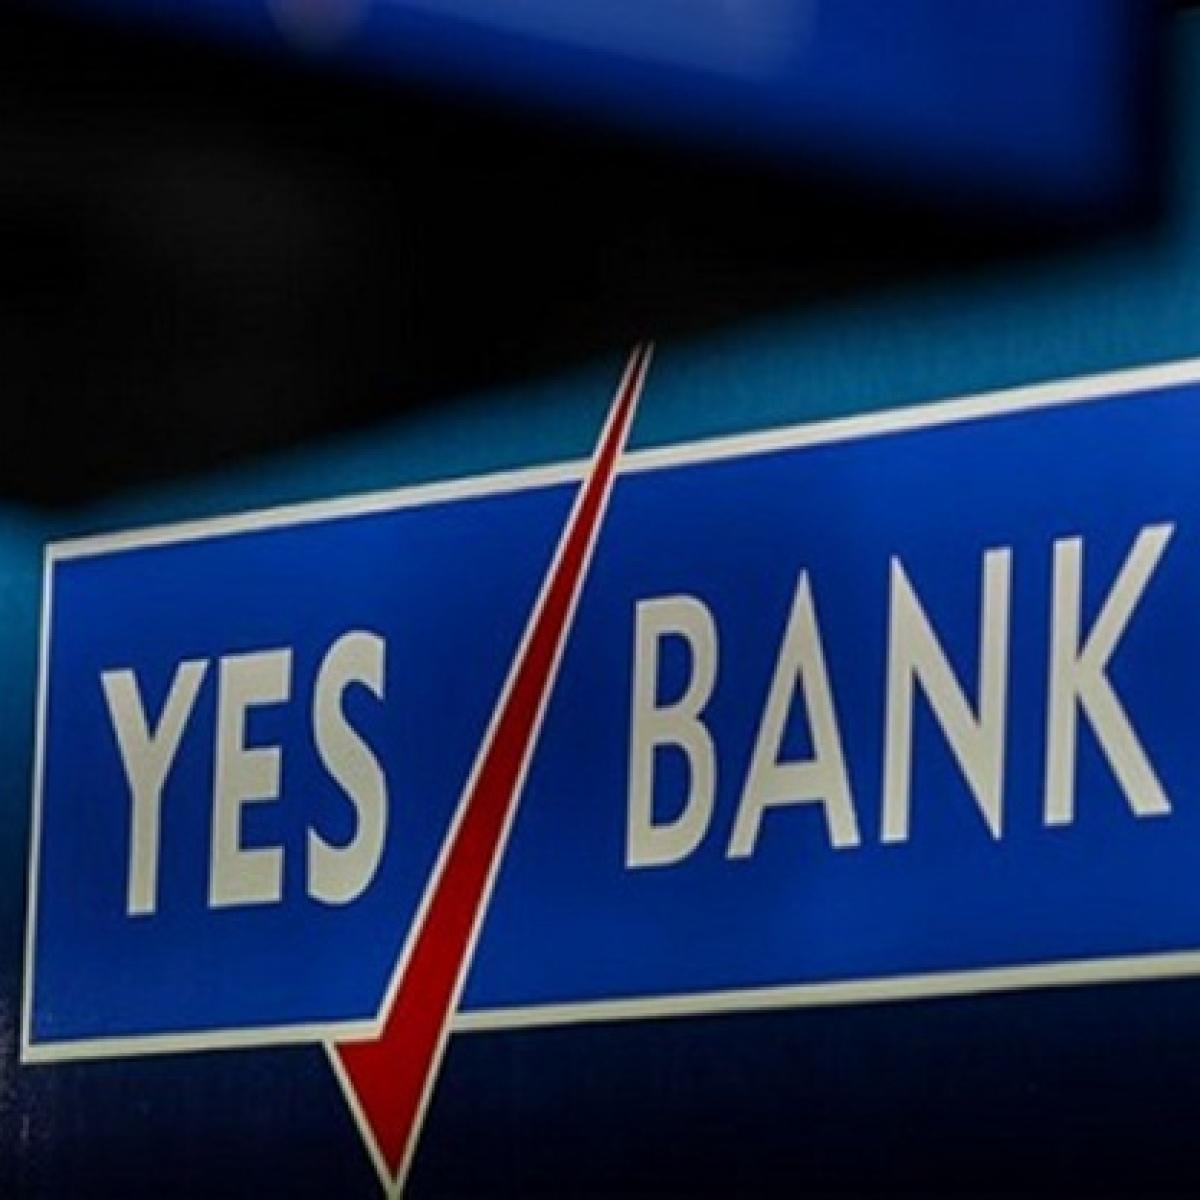 Yes Bank Bad Loans: ED summons Subhash Chandra, Anil Ambani, Gautam Thapar, Wadhawans and Sameer Gehlaut